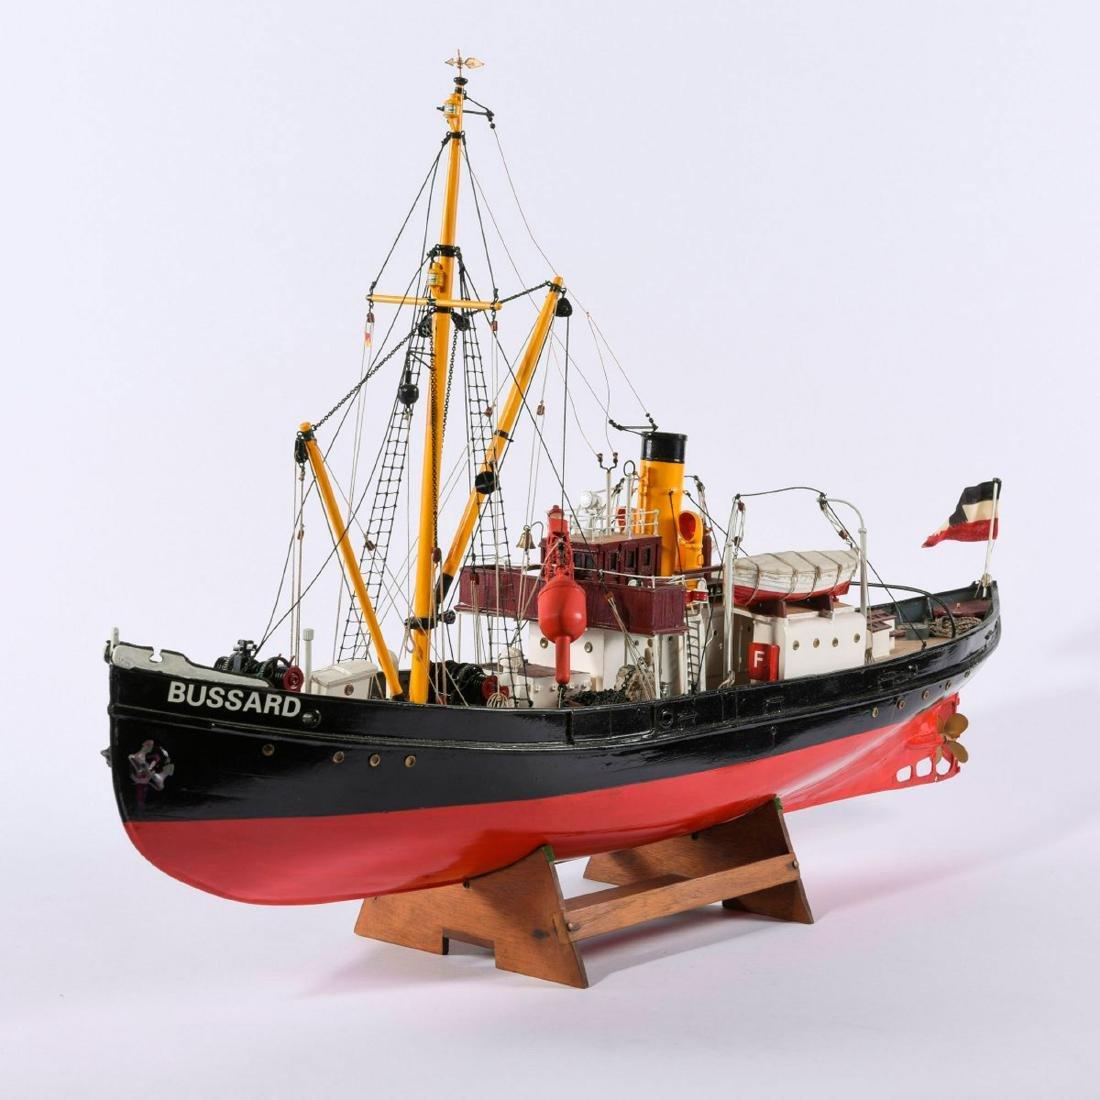 Model steamboat 'Bussard' - 6